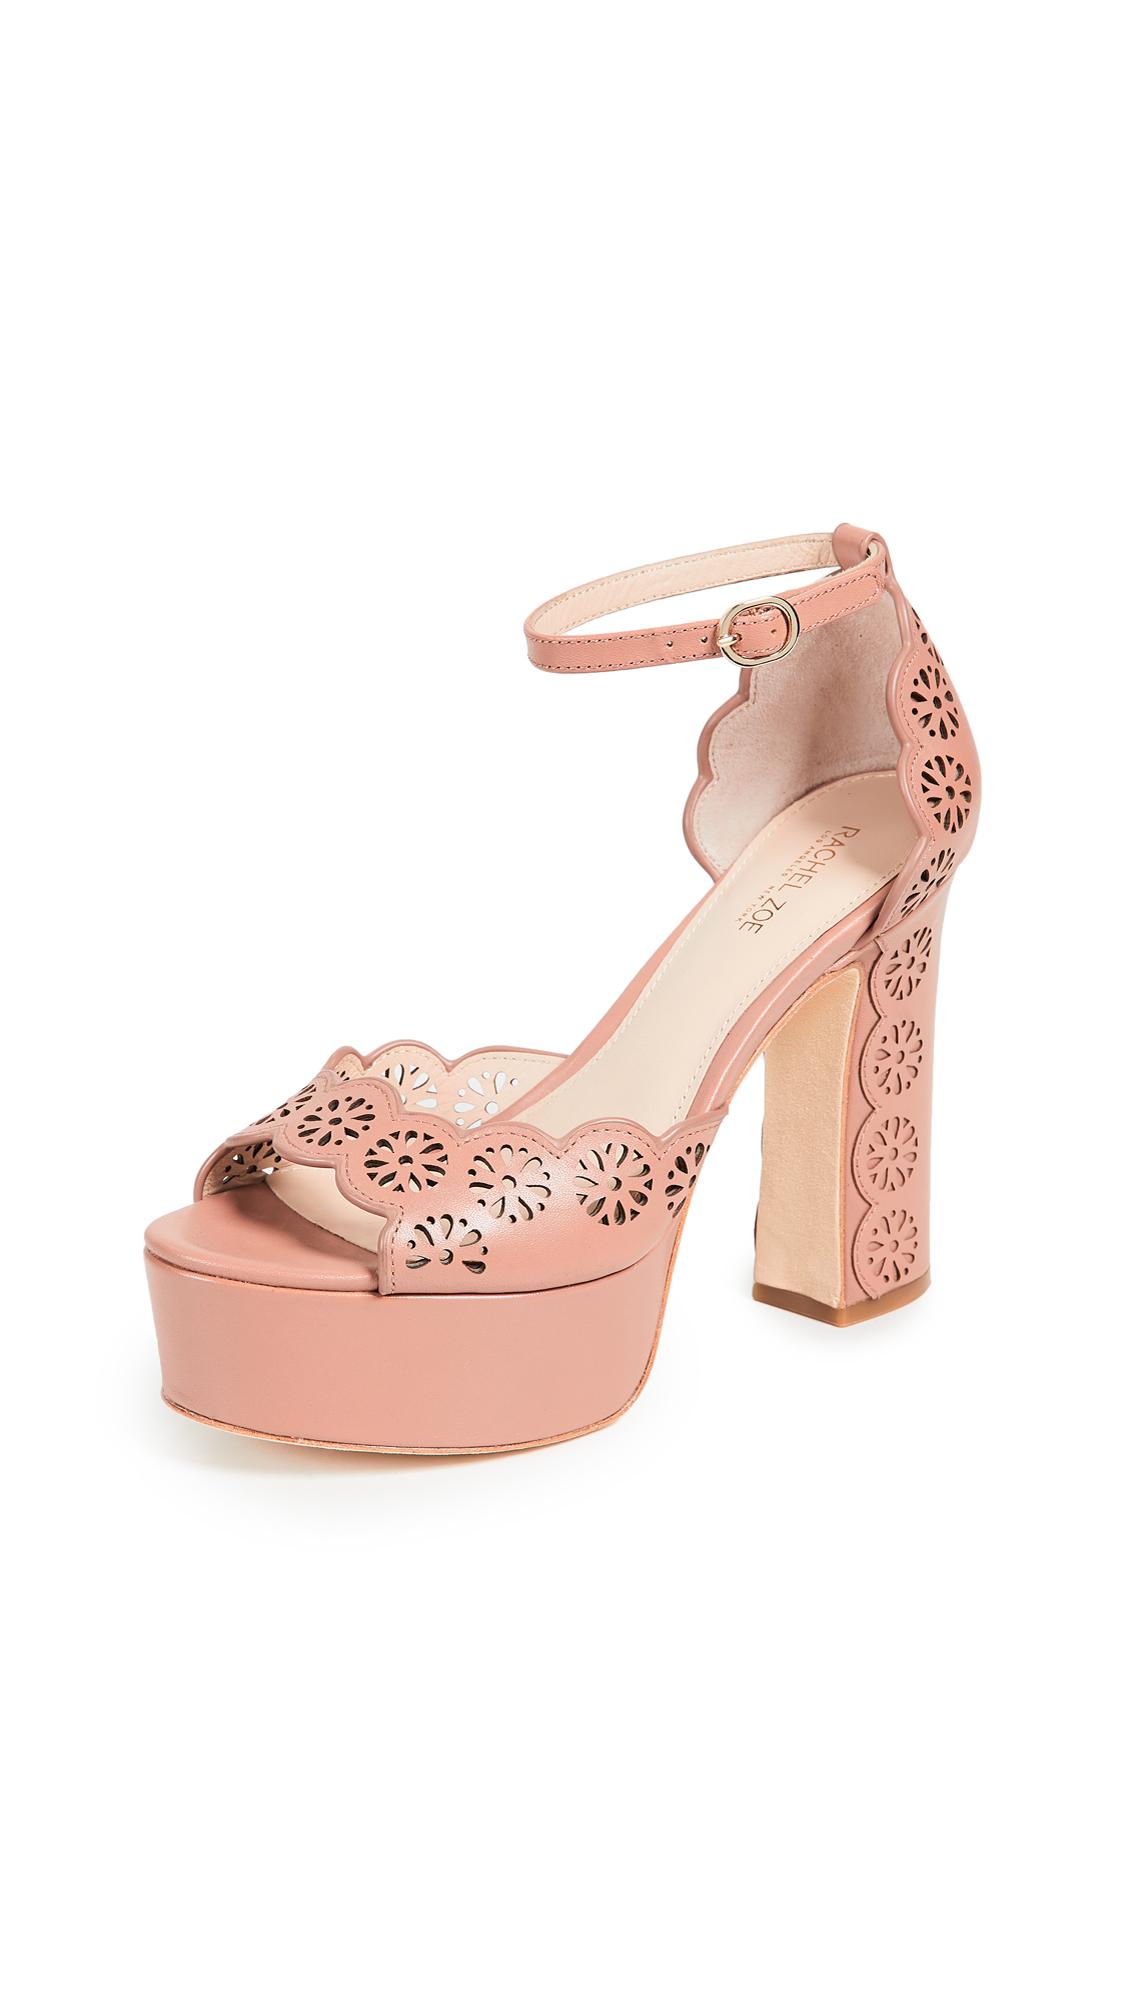 Rachel Zoe Jenelle Platform Sandals - Cedar